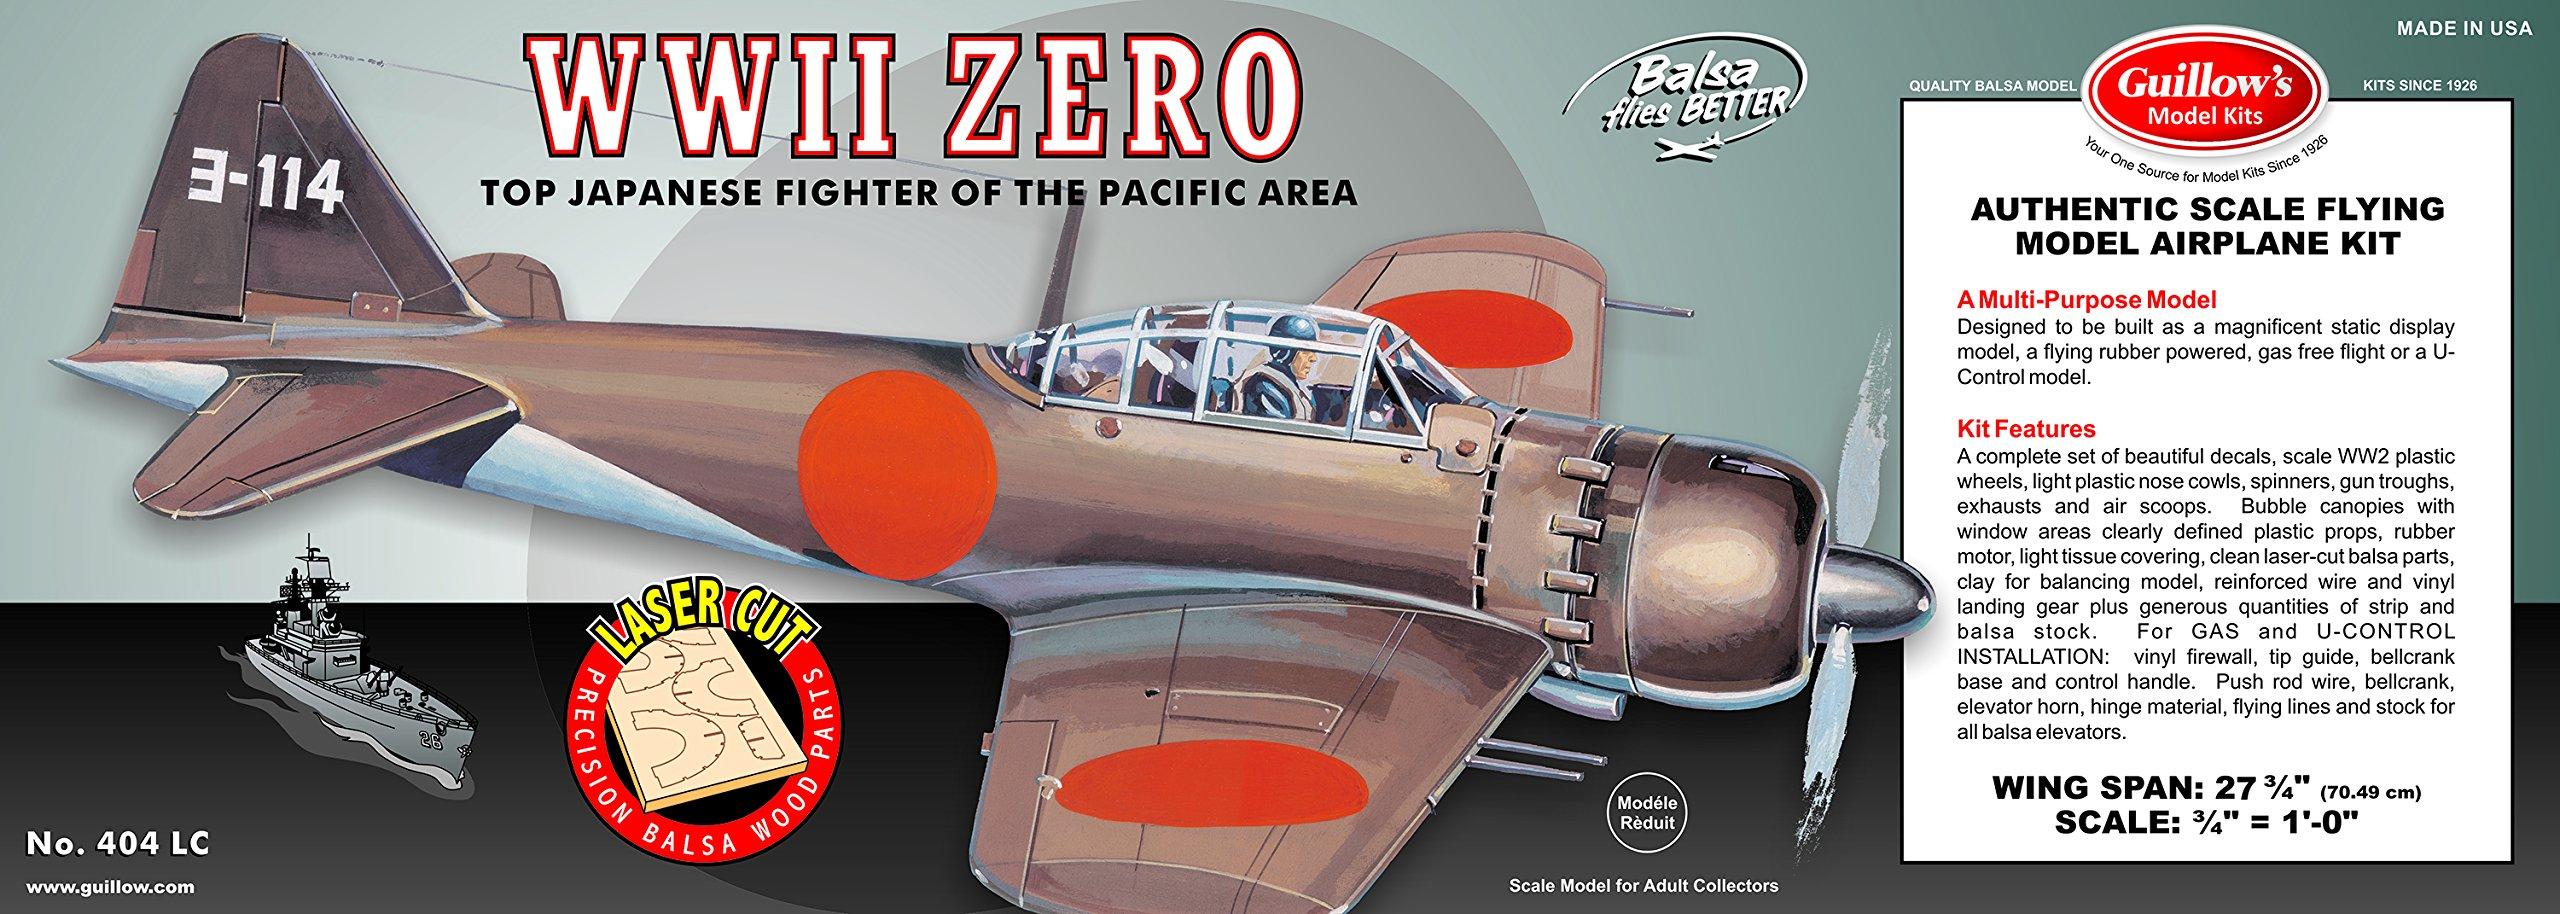 Guillow's WWII Zero Laser Cut Model Kit by Guillow